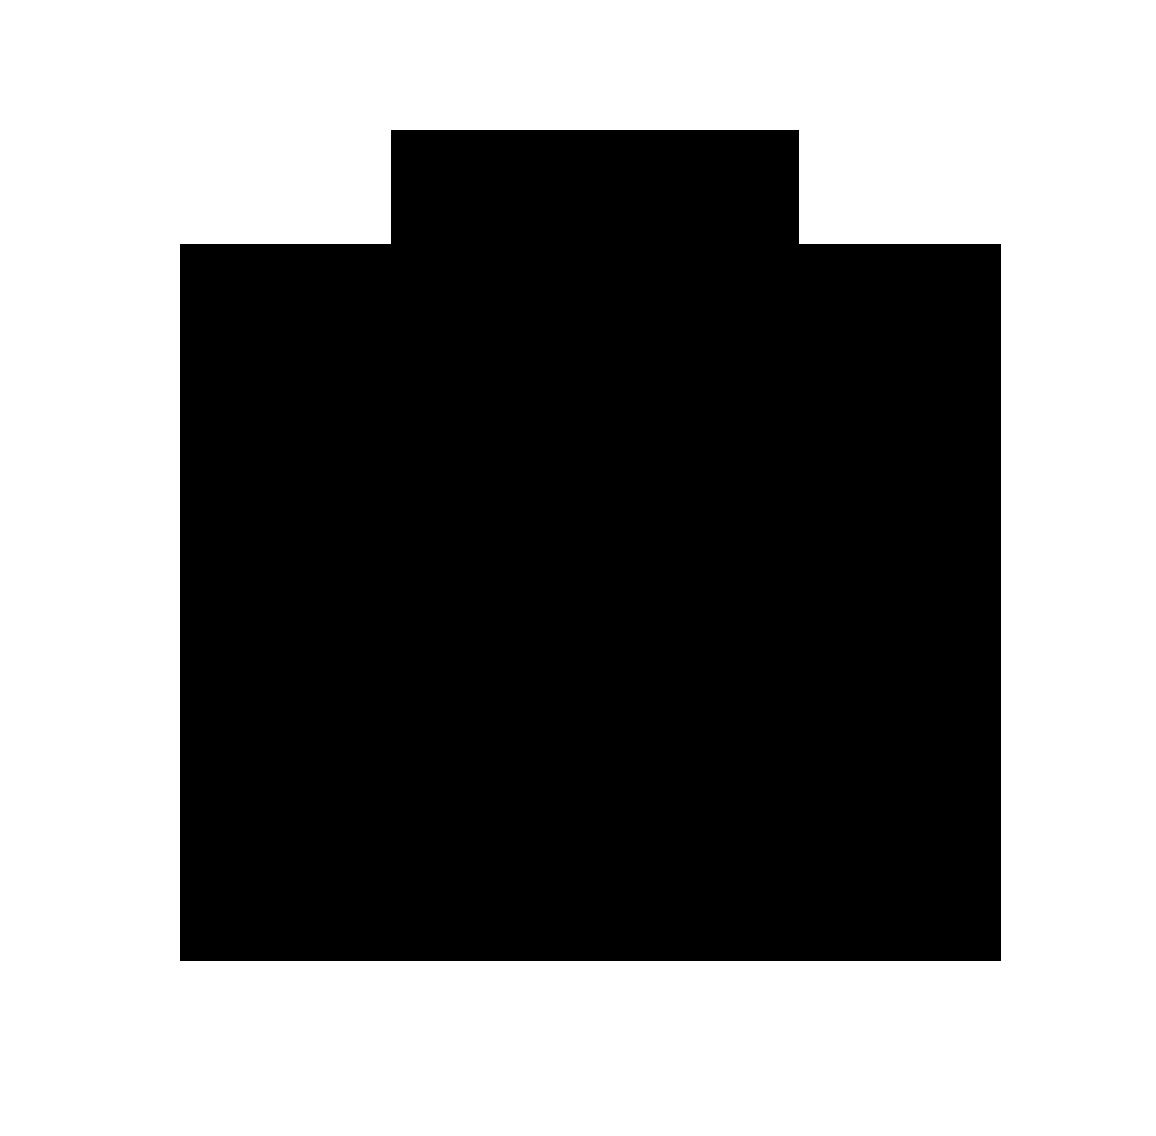 MaryPoppins_MT_black_v2.png